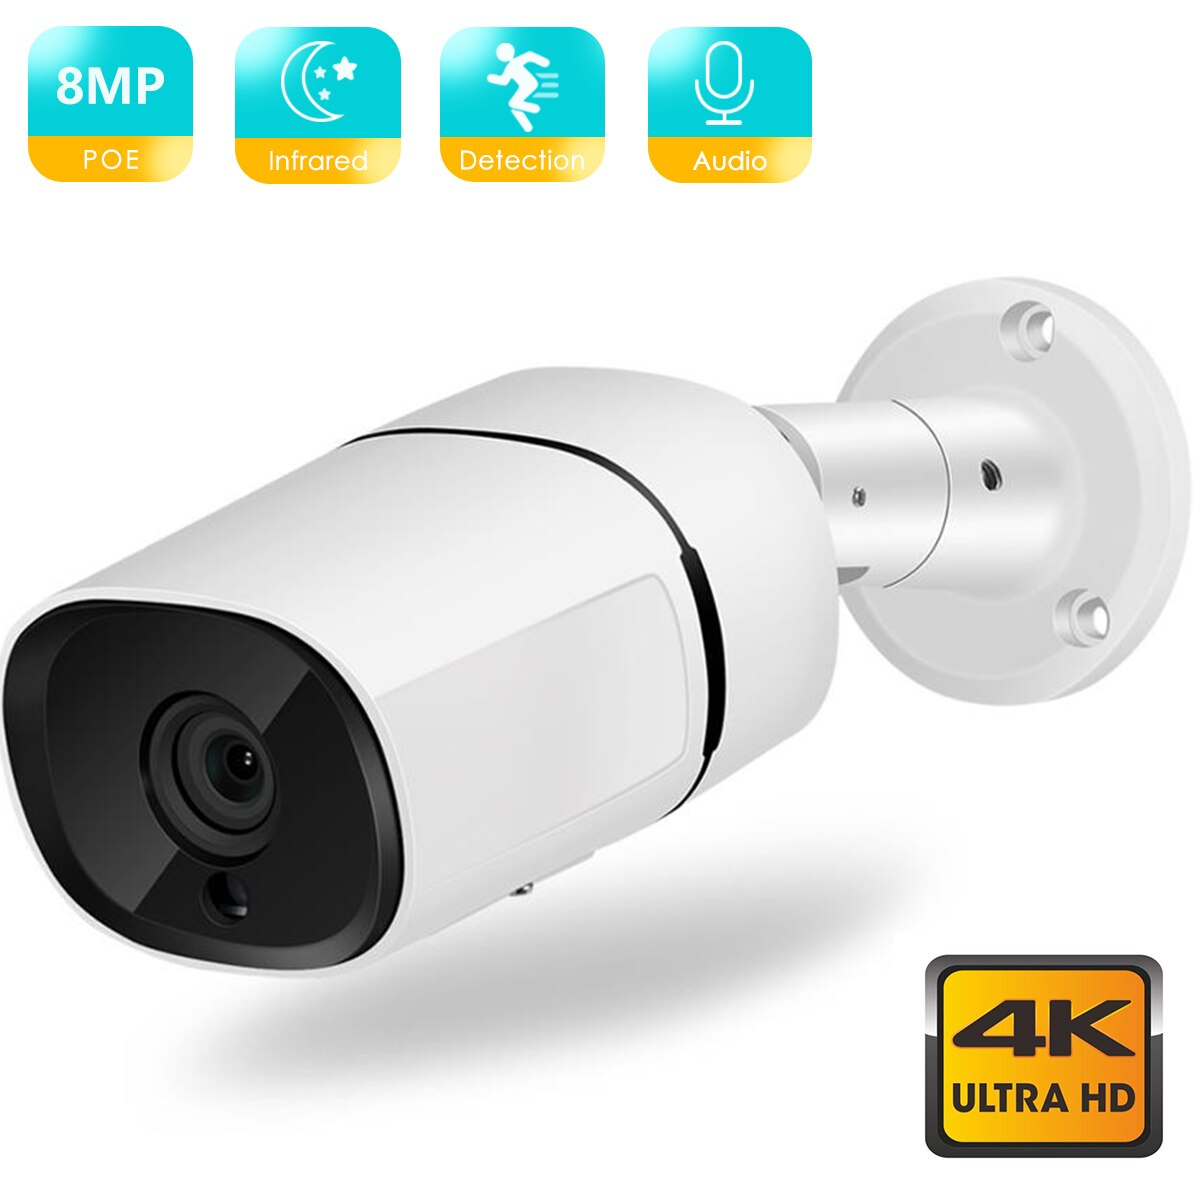 BESDER 4K 8MP 4MP Ultra HD H.265 POE IP Camera Audio AI Humanoid Detection Waterproof Video Surveillance Camera IR Night Vision